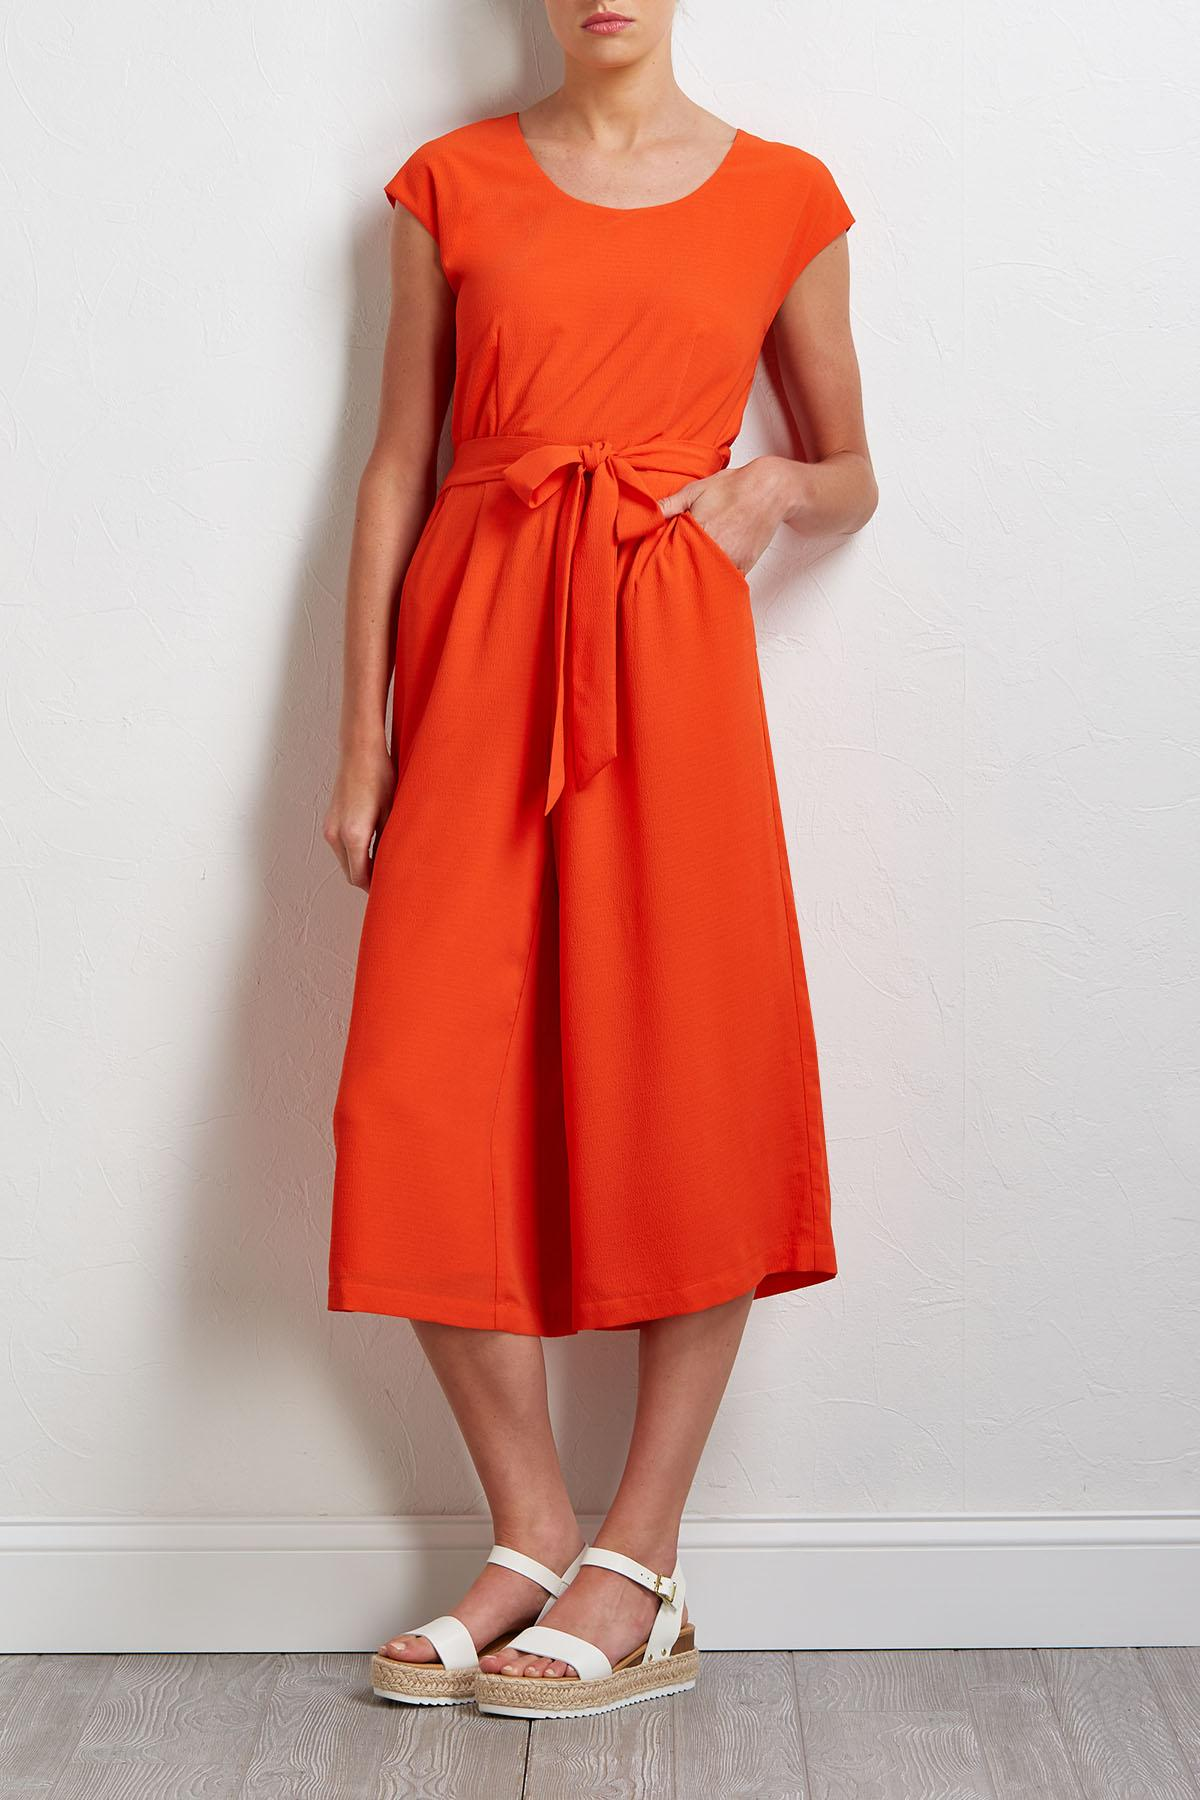 Orangesicle Jumpsuit